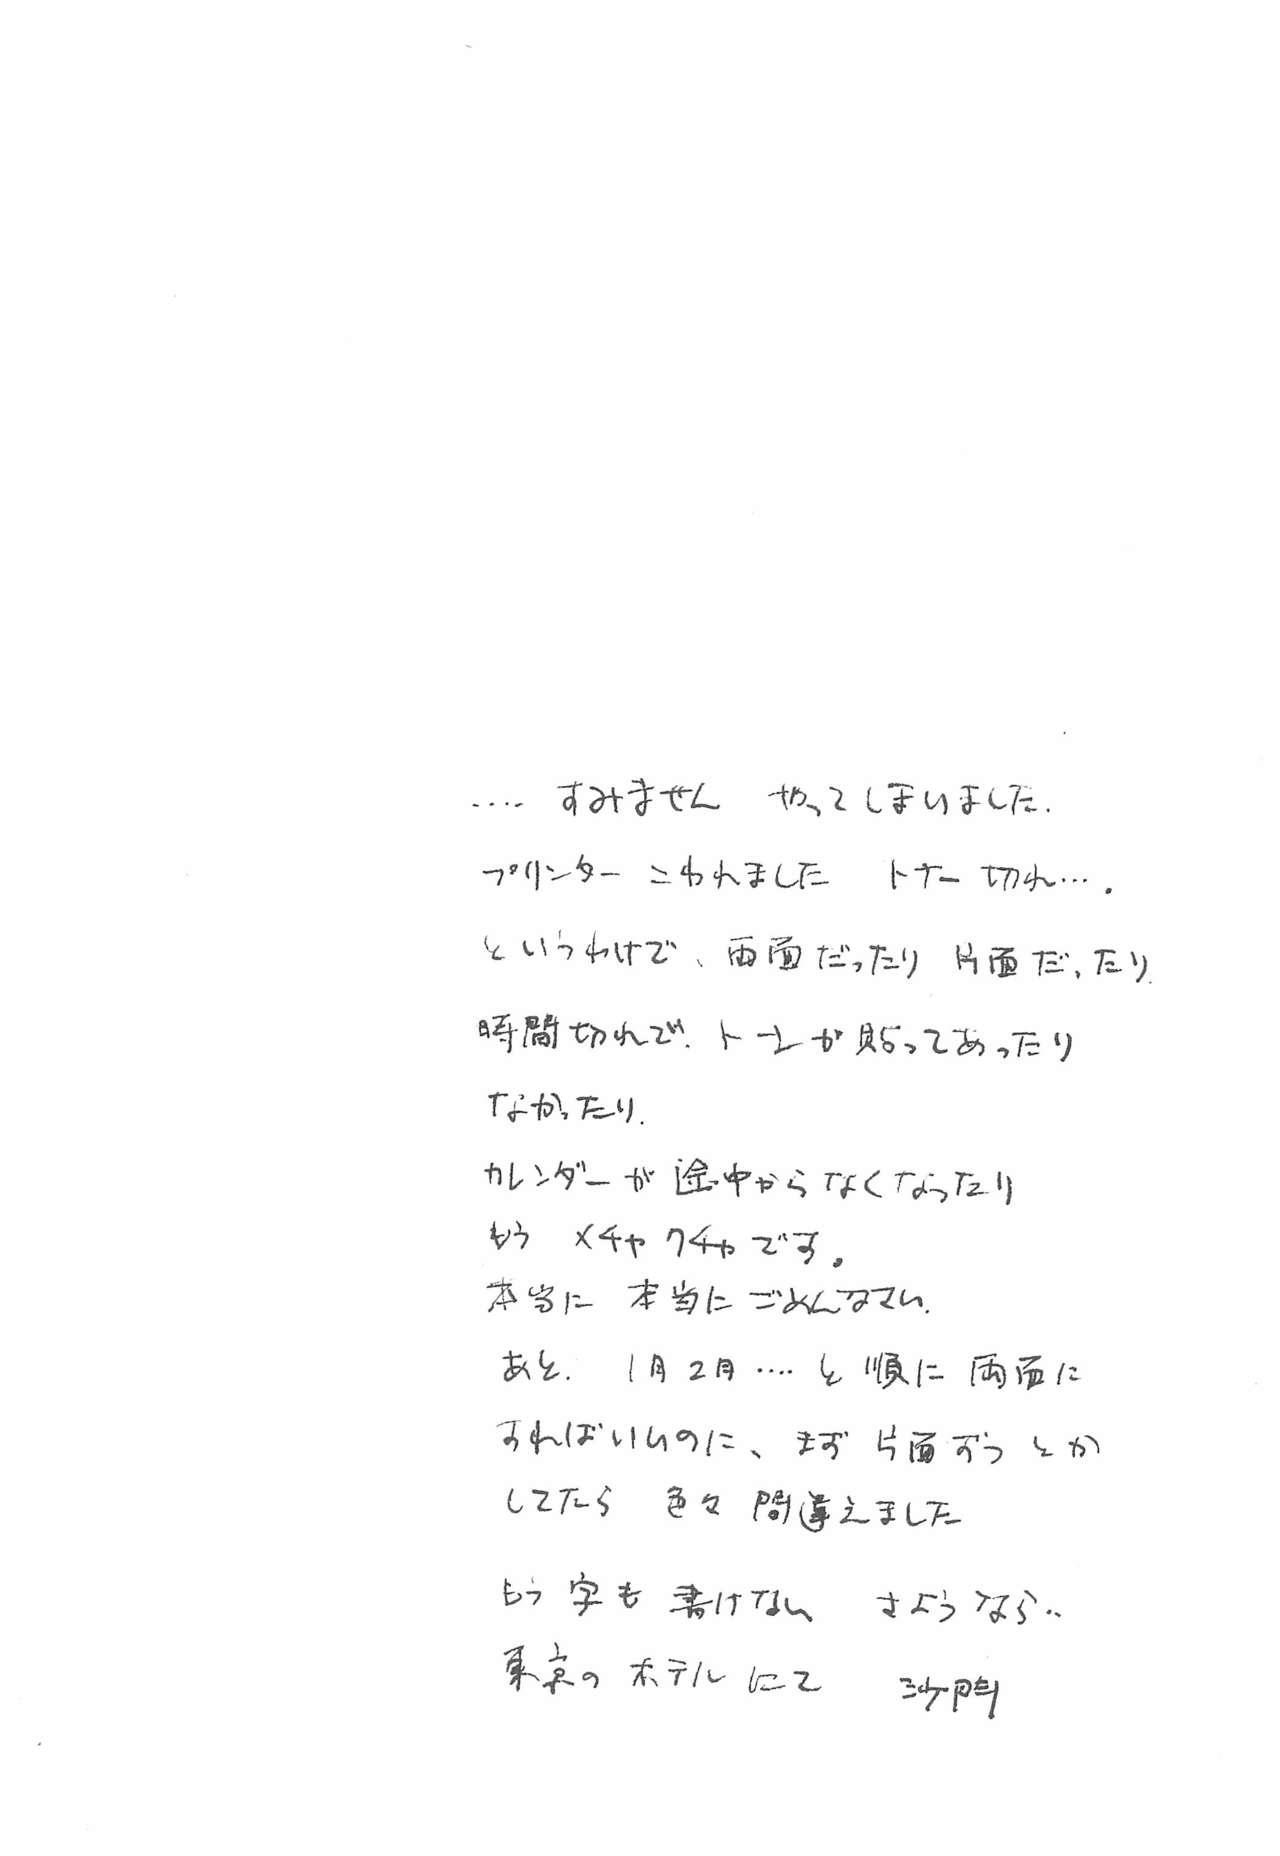 (C72) [Shamon Tei (Shamon)] KamiShimo to Ichinenjuu 2007-nen 9-gatsu - 2008-nen 8-gatsu Calendar (Gurren Lagann) 15